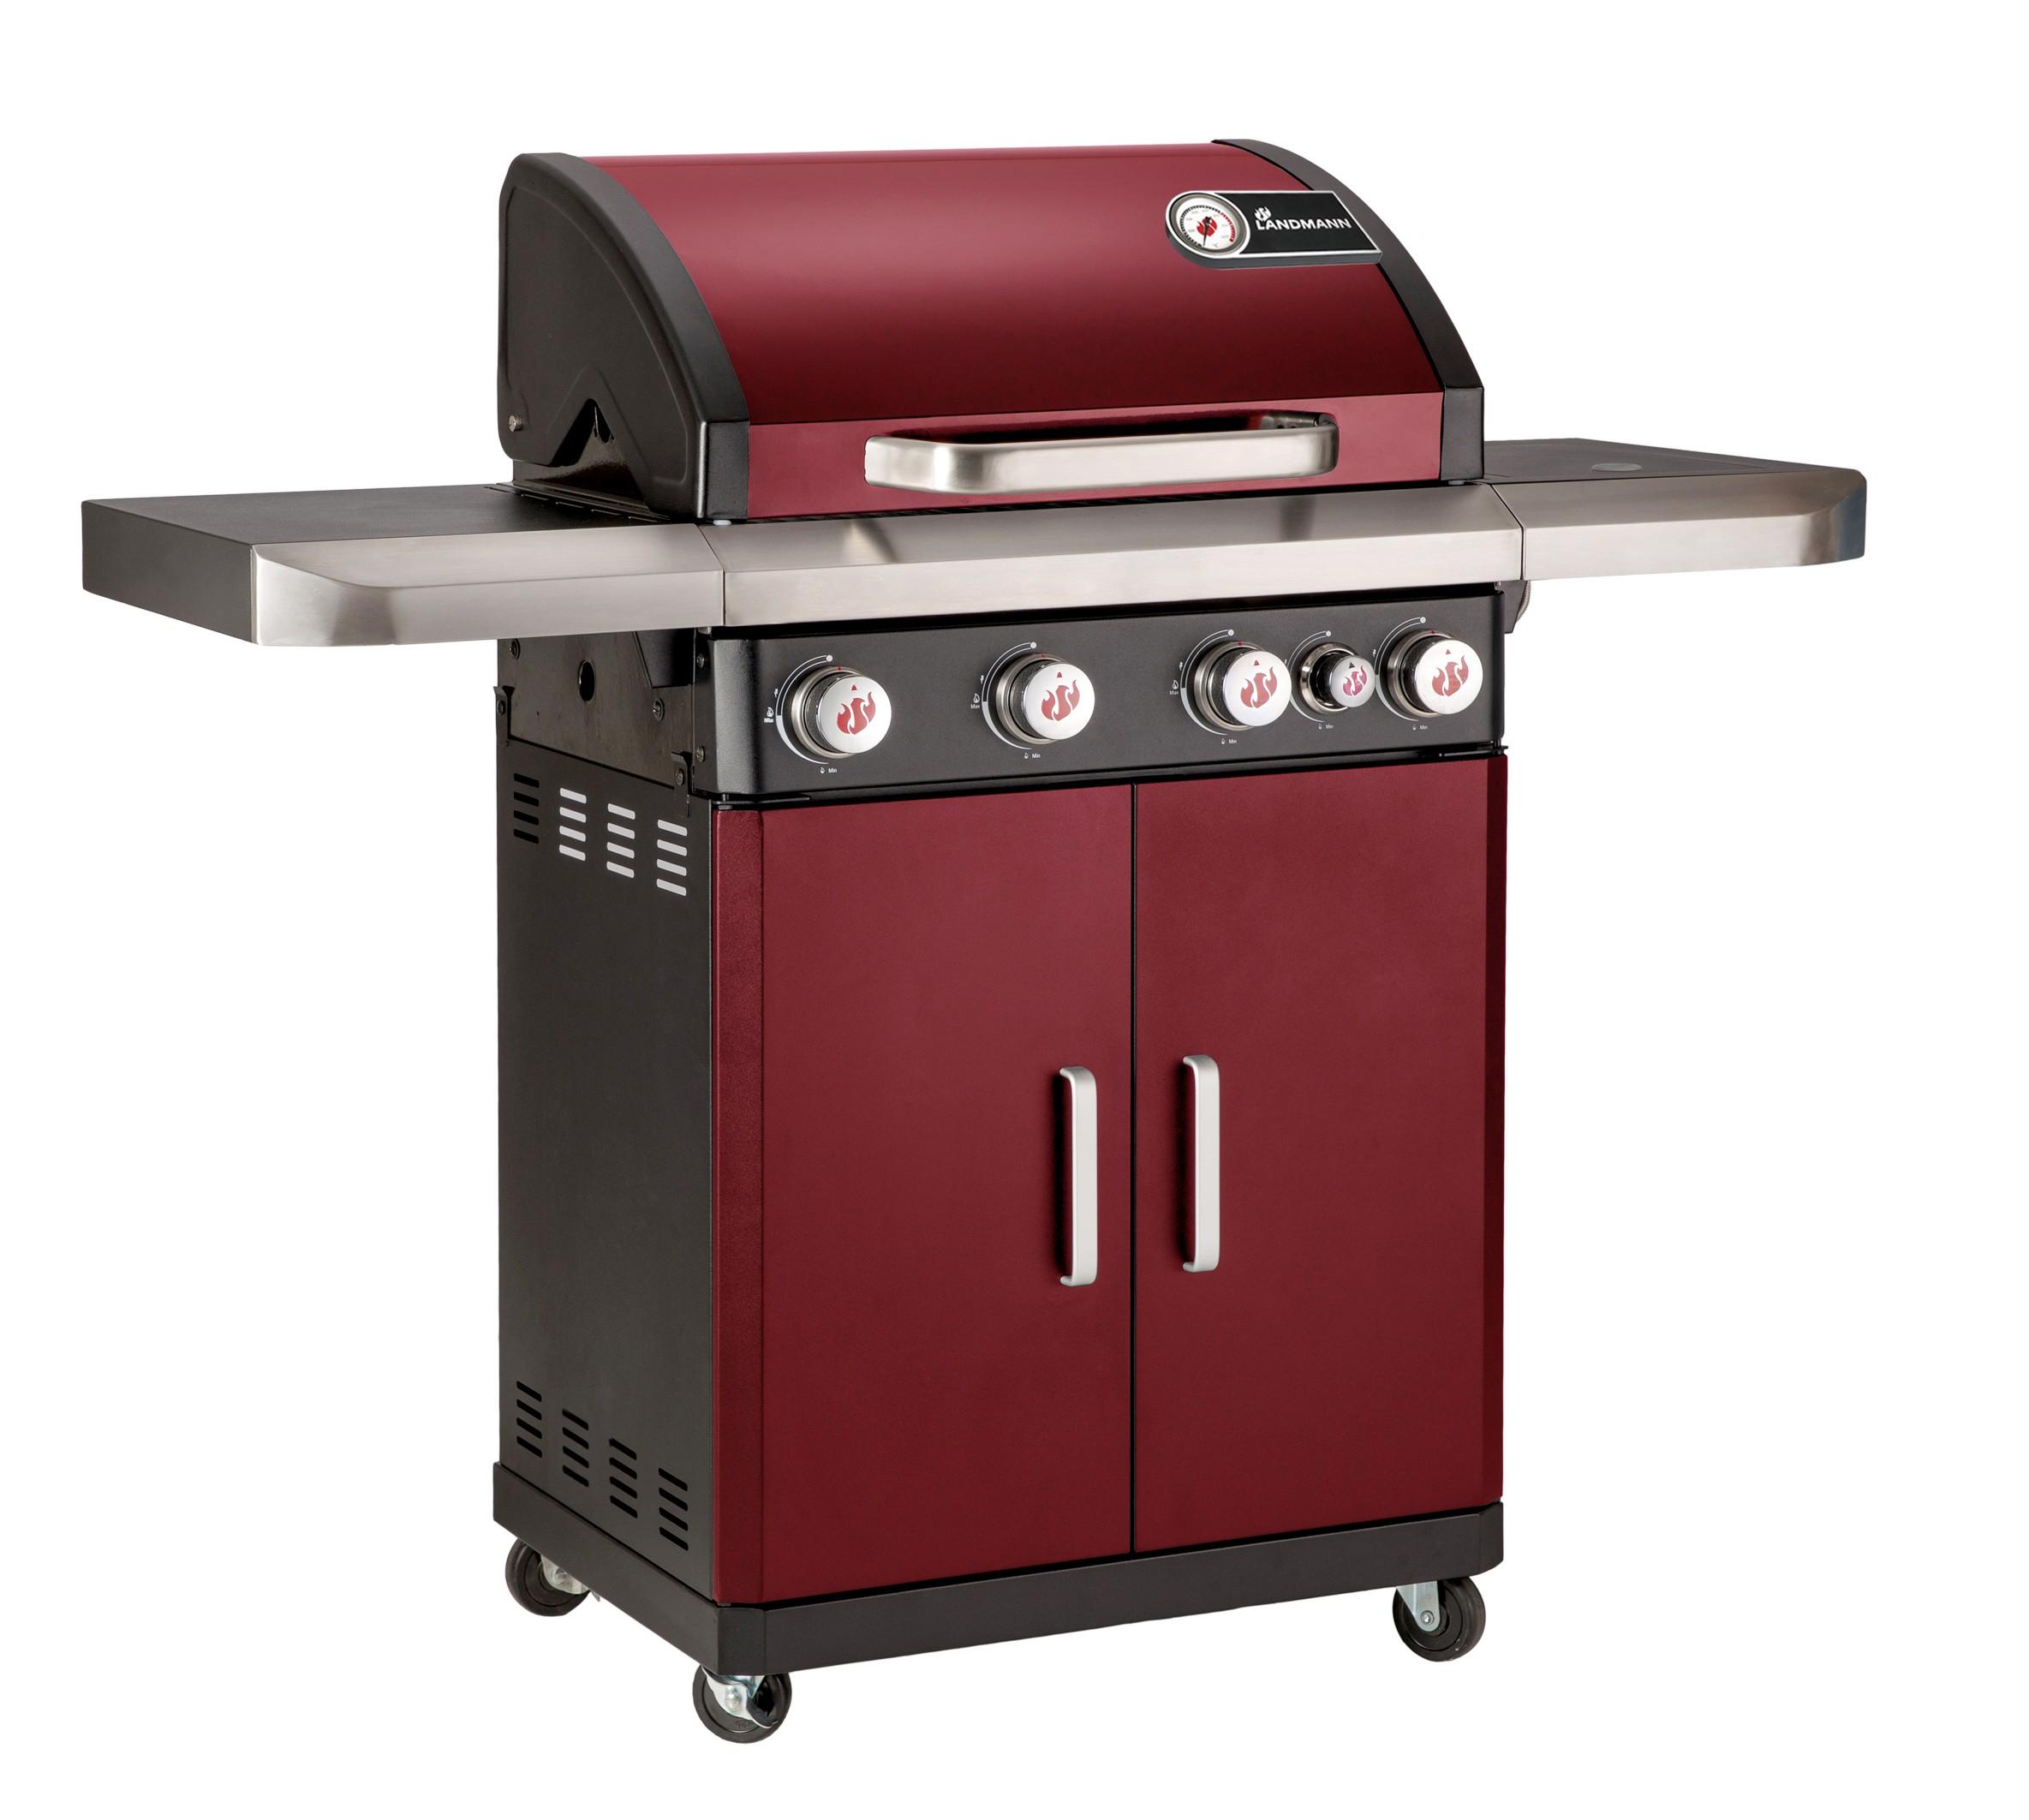 landmann rexon 4.1 gas barbecue - red